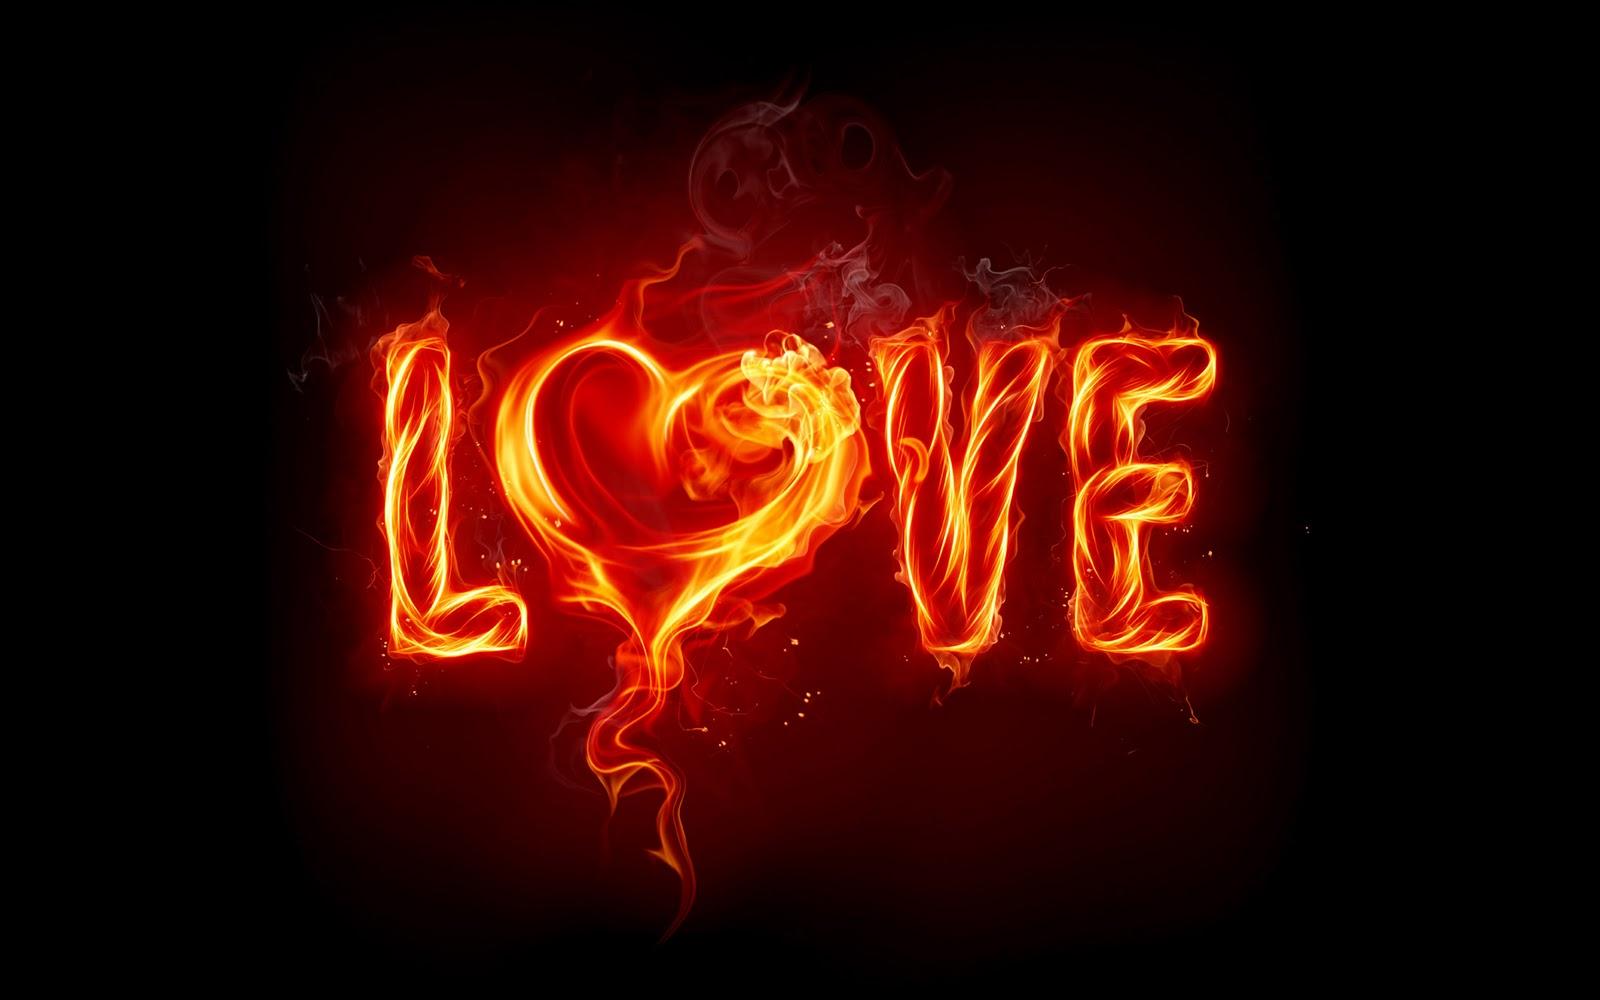 http://2.bp.blogspot.com/_nD_YgZuOadA/TVE7jEXHAtI/AAAAAAAABYE/5fwD7bx_tZQ/s1600/burning-love-hd-wallpaper-1920x1200.jpg